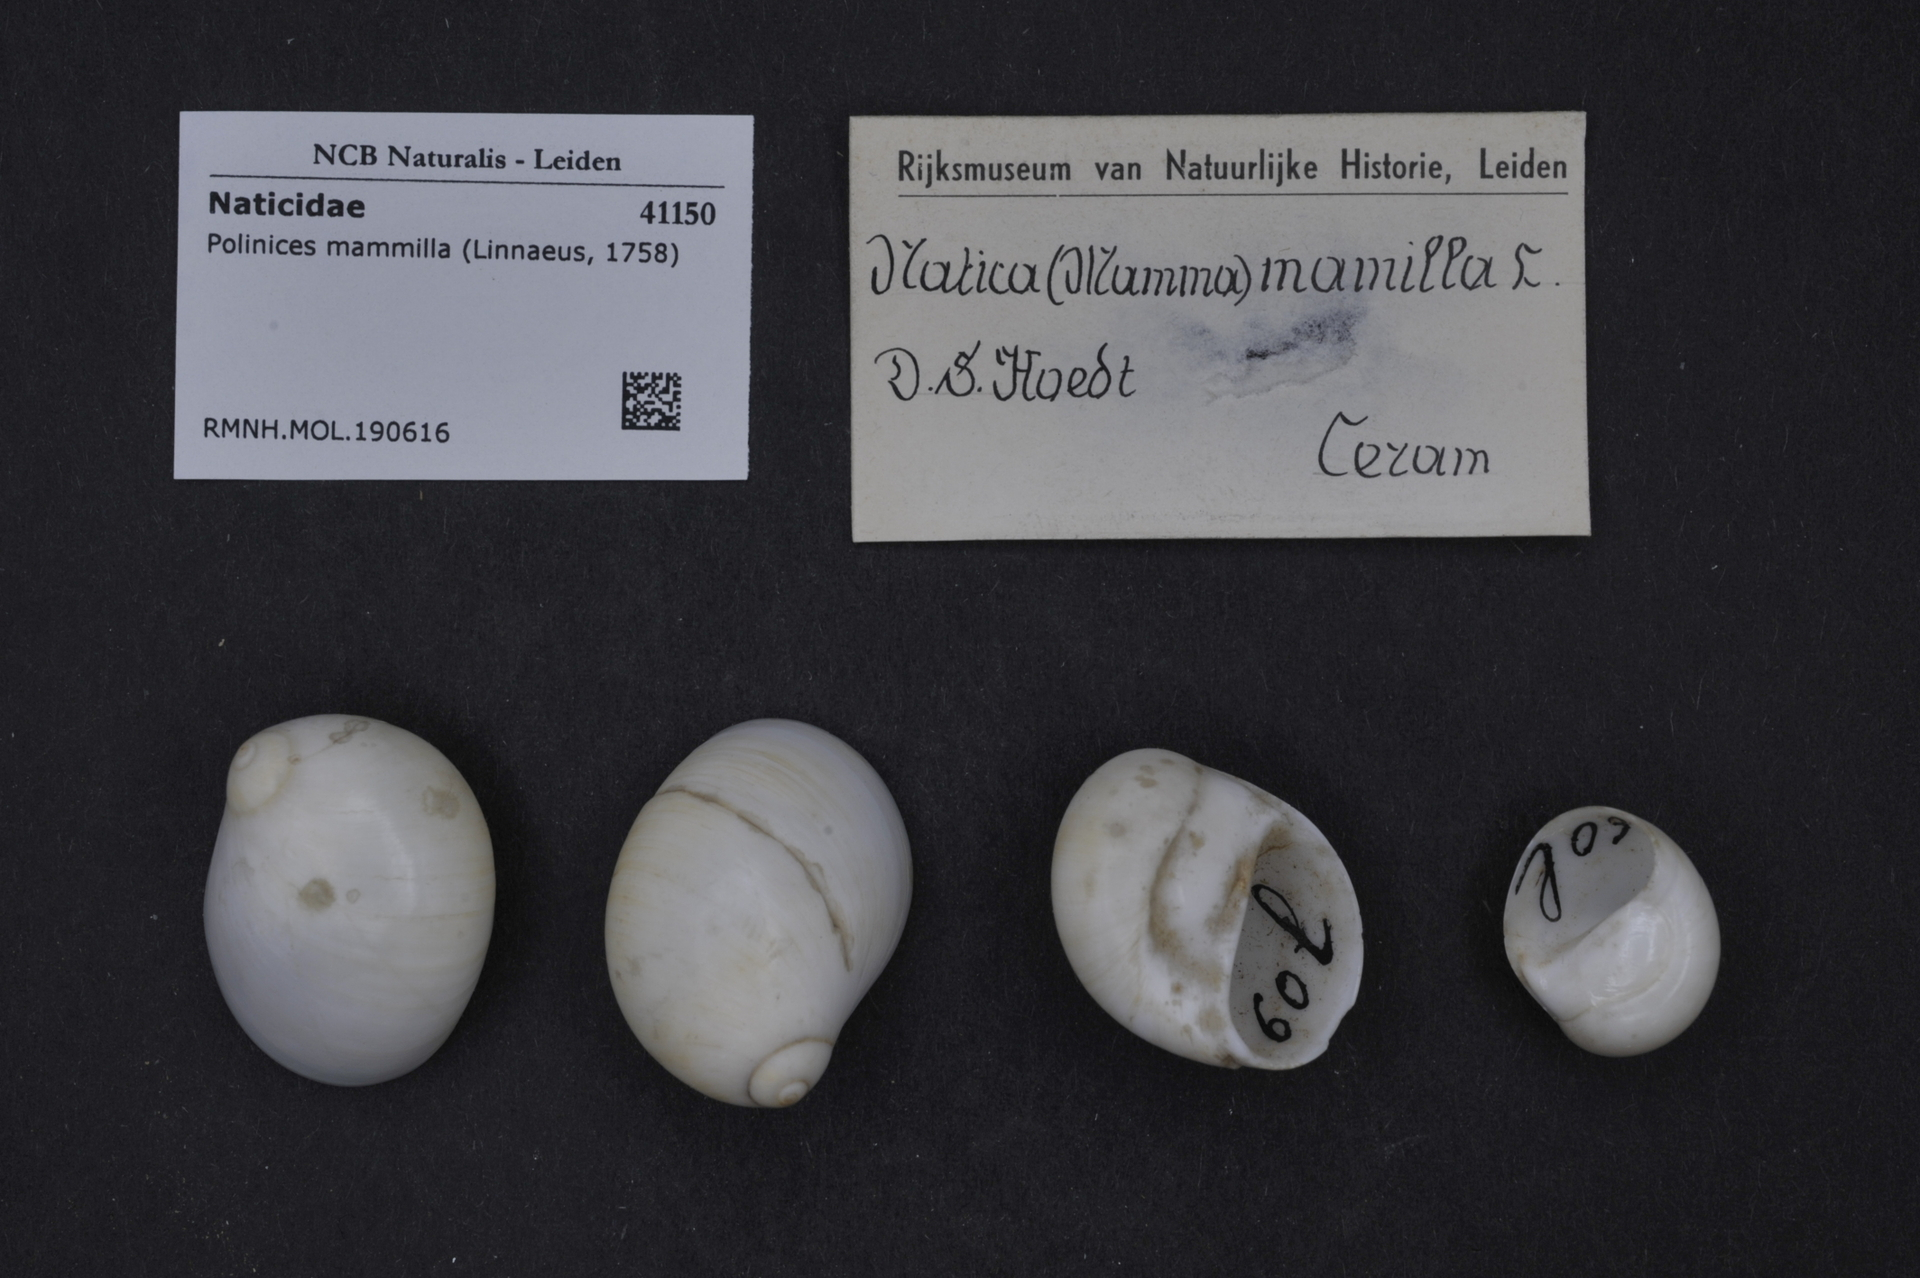 RMNH.MOL.190616 | Polinices mammilla (Linnaeus, 1758)